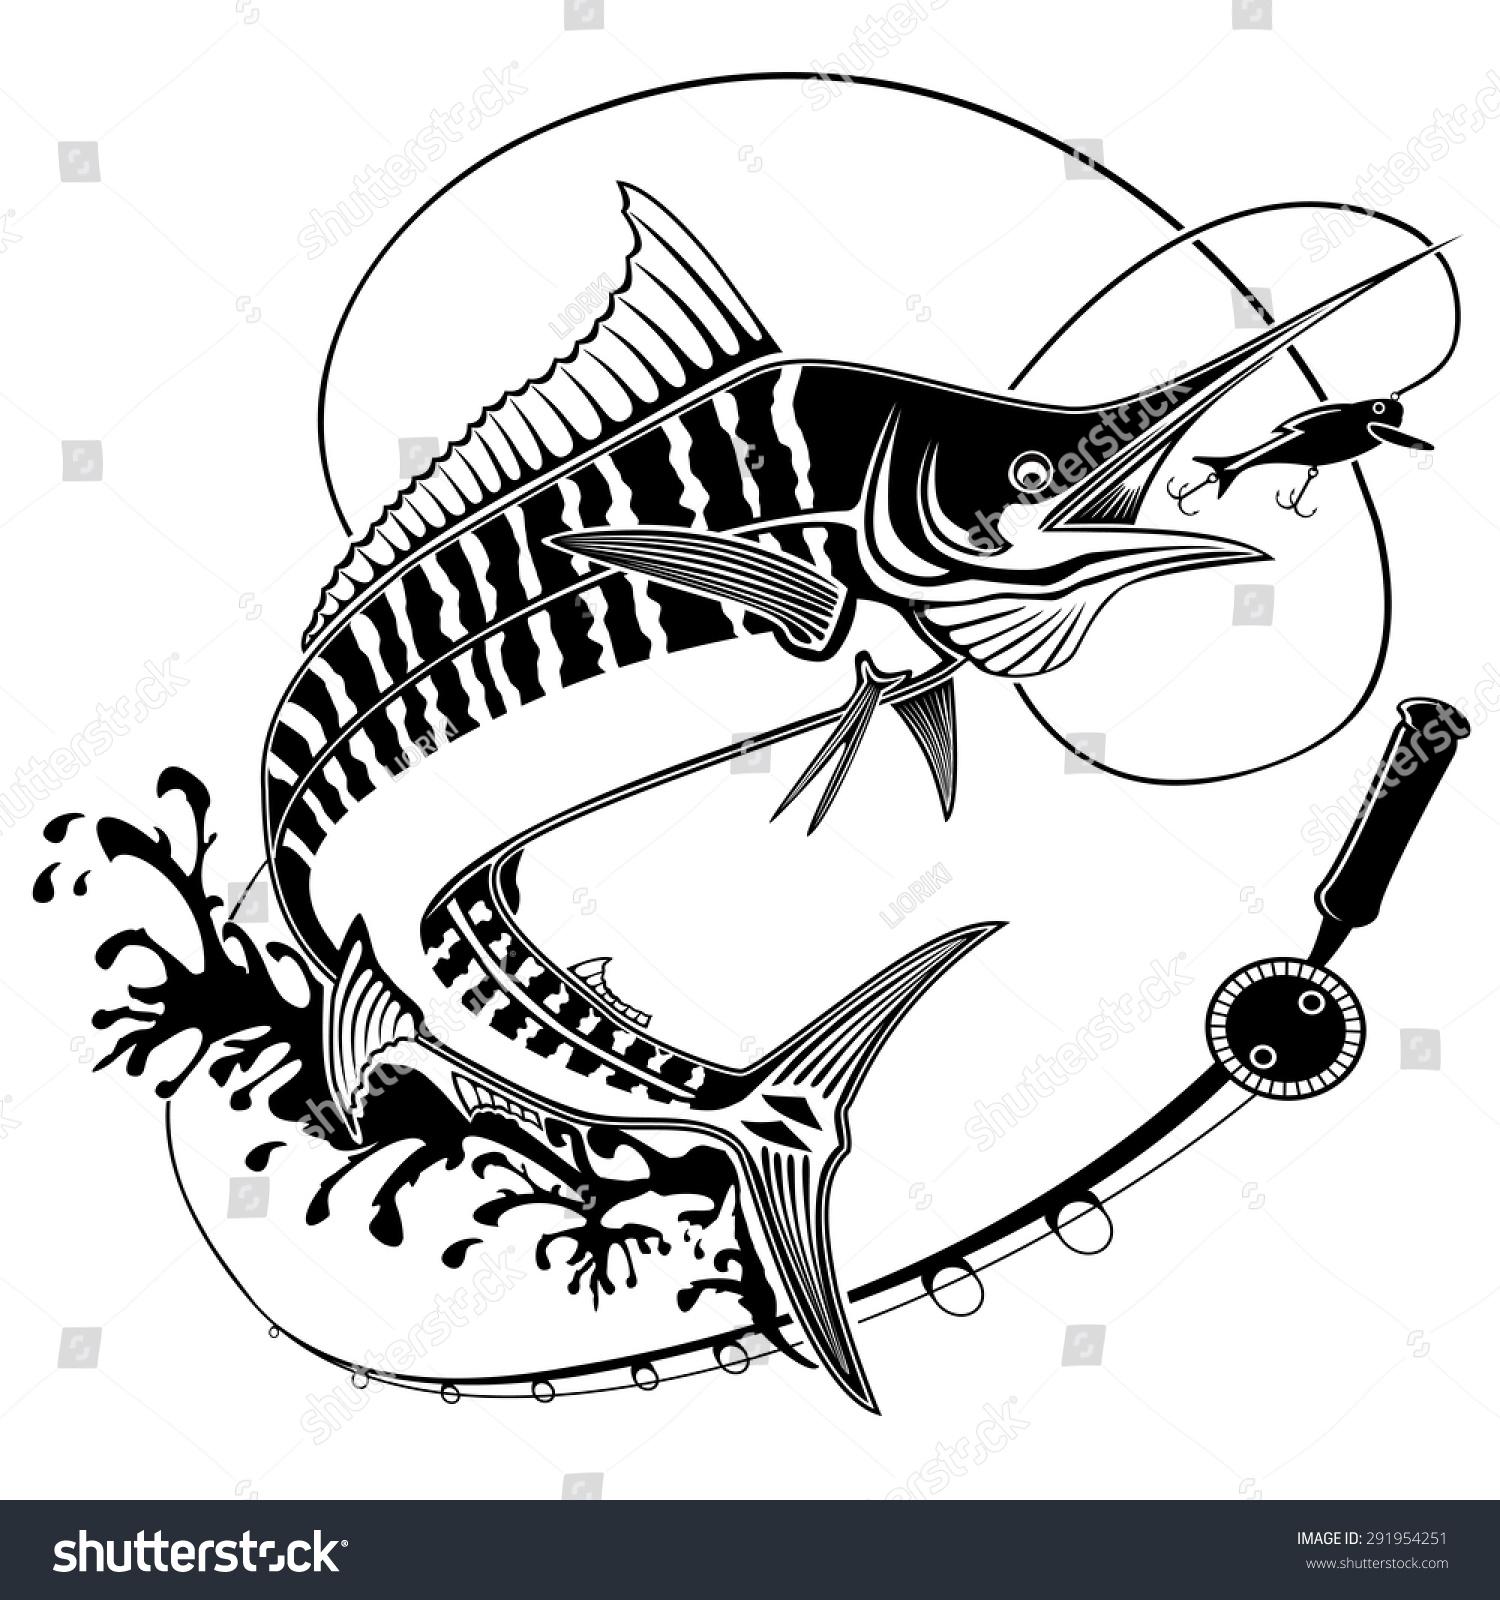 Vector Illustration Marline Fish Waves Fishing Stock Vector ...